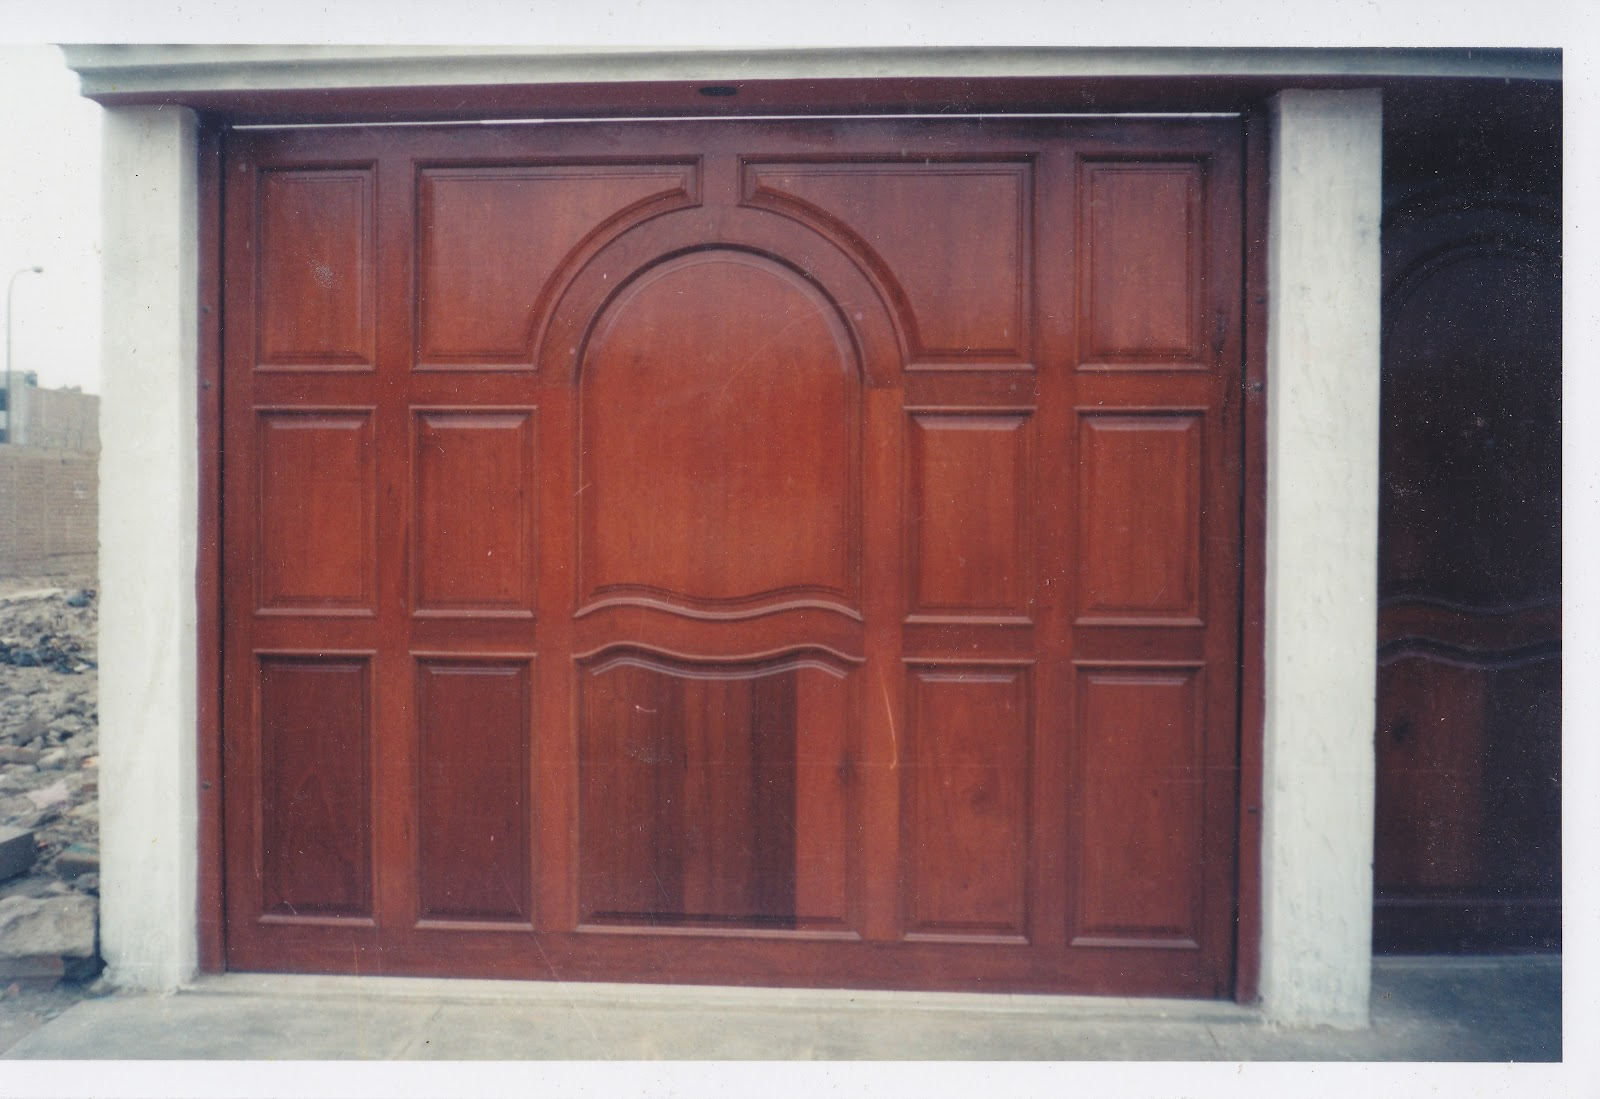 Puerta garaje madera seccional imitacin madera puerta - Tipos de puertas de garaje ...